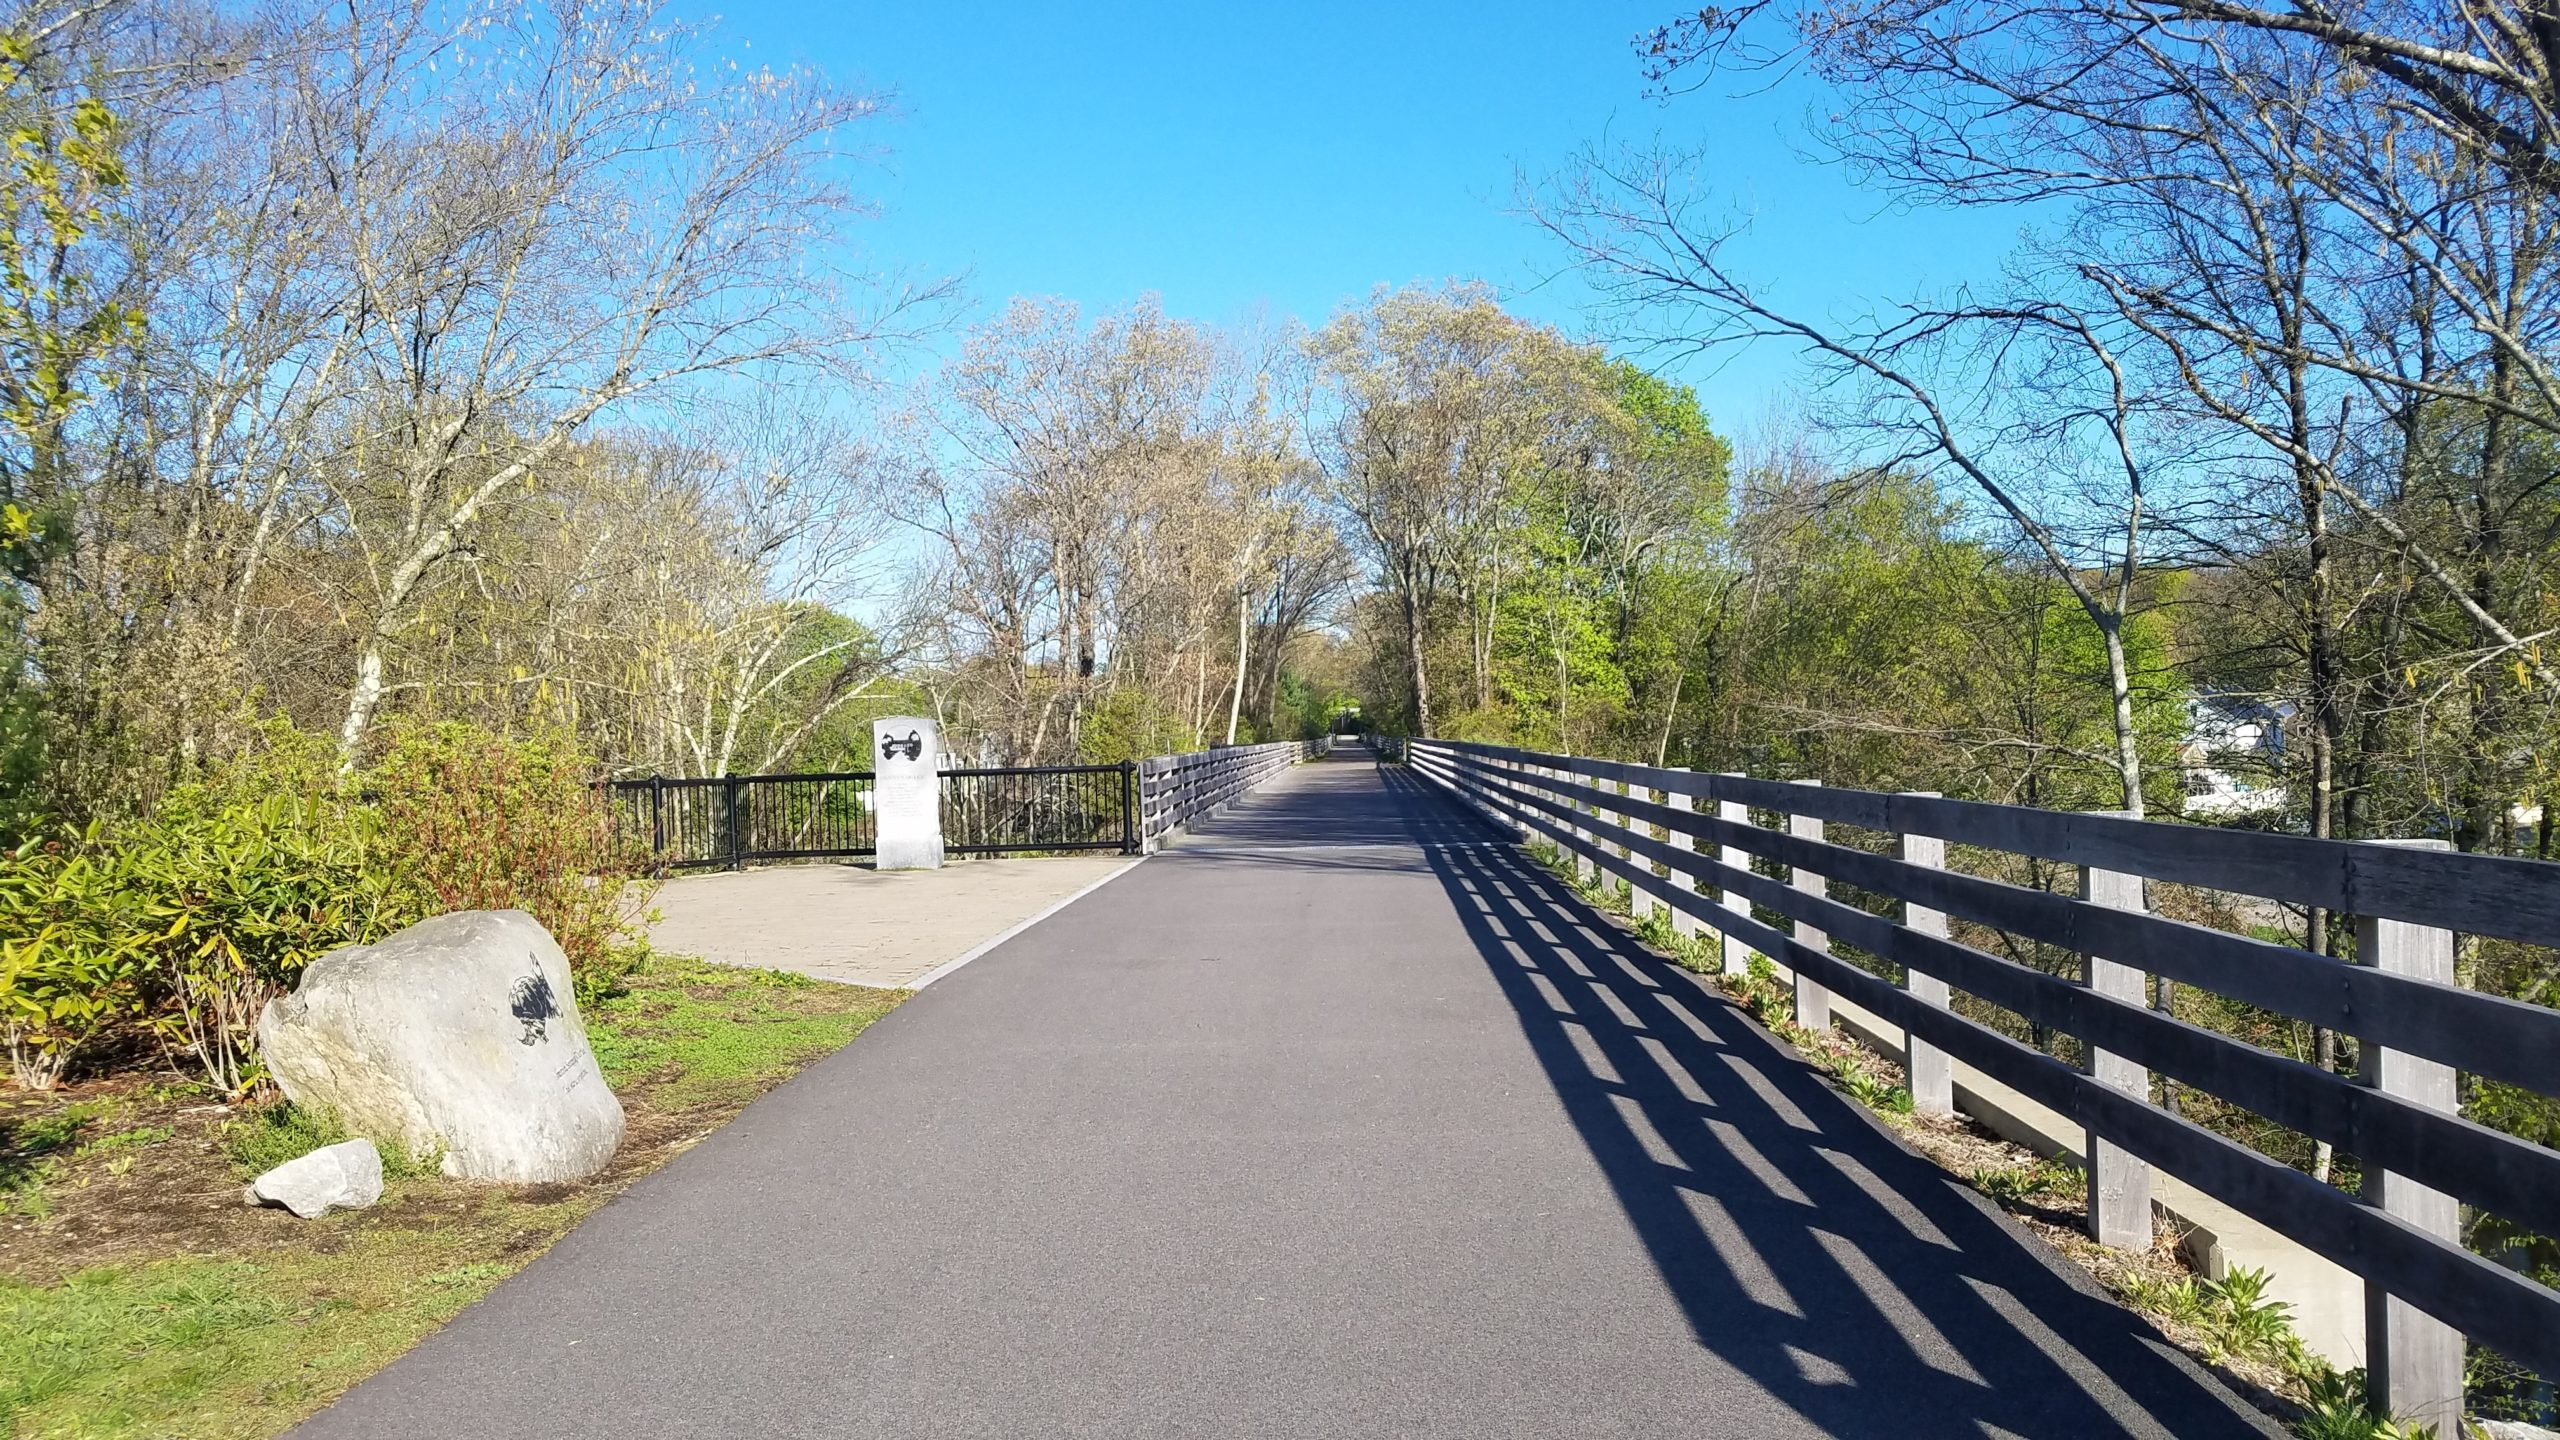 Blackstone River Greenway first bridge 3